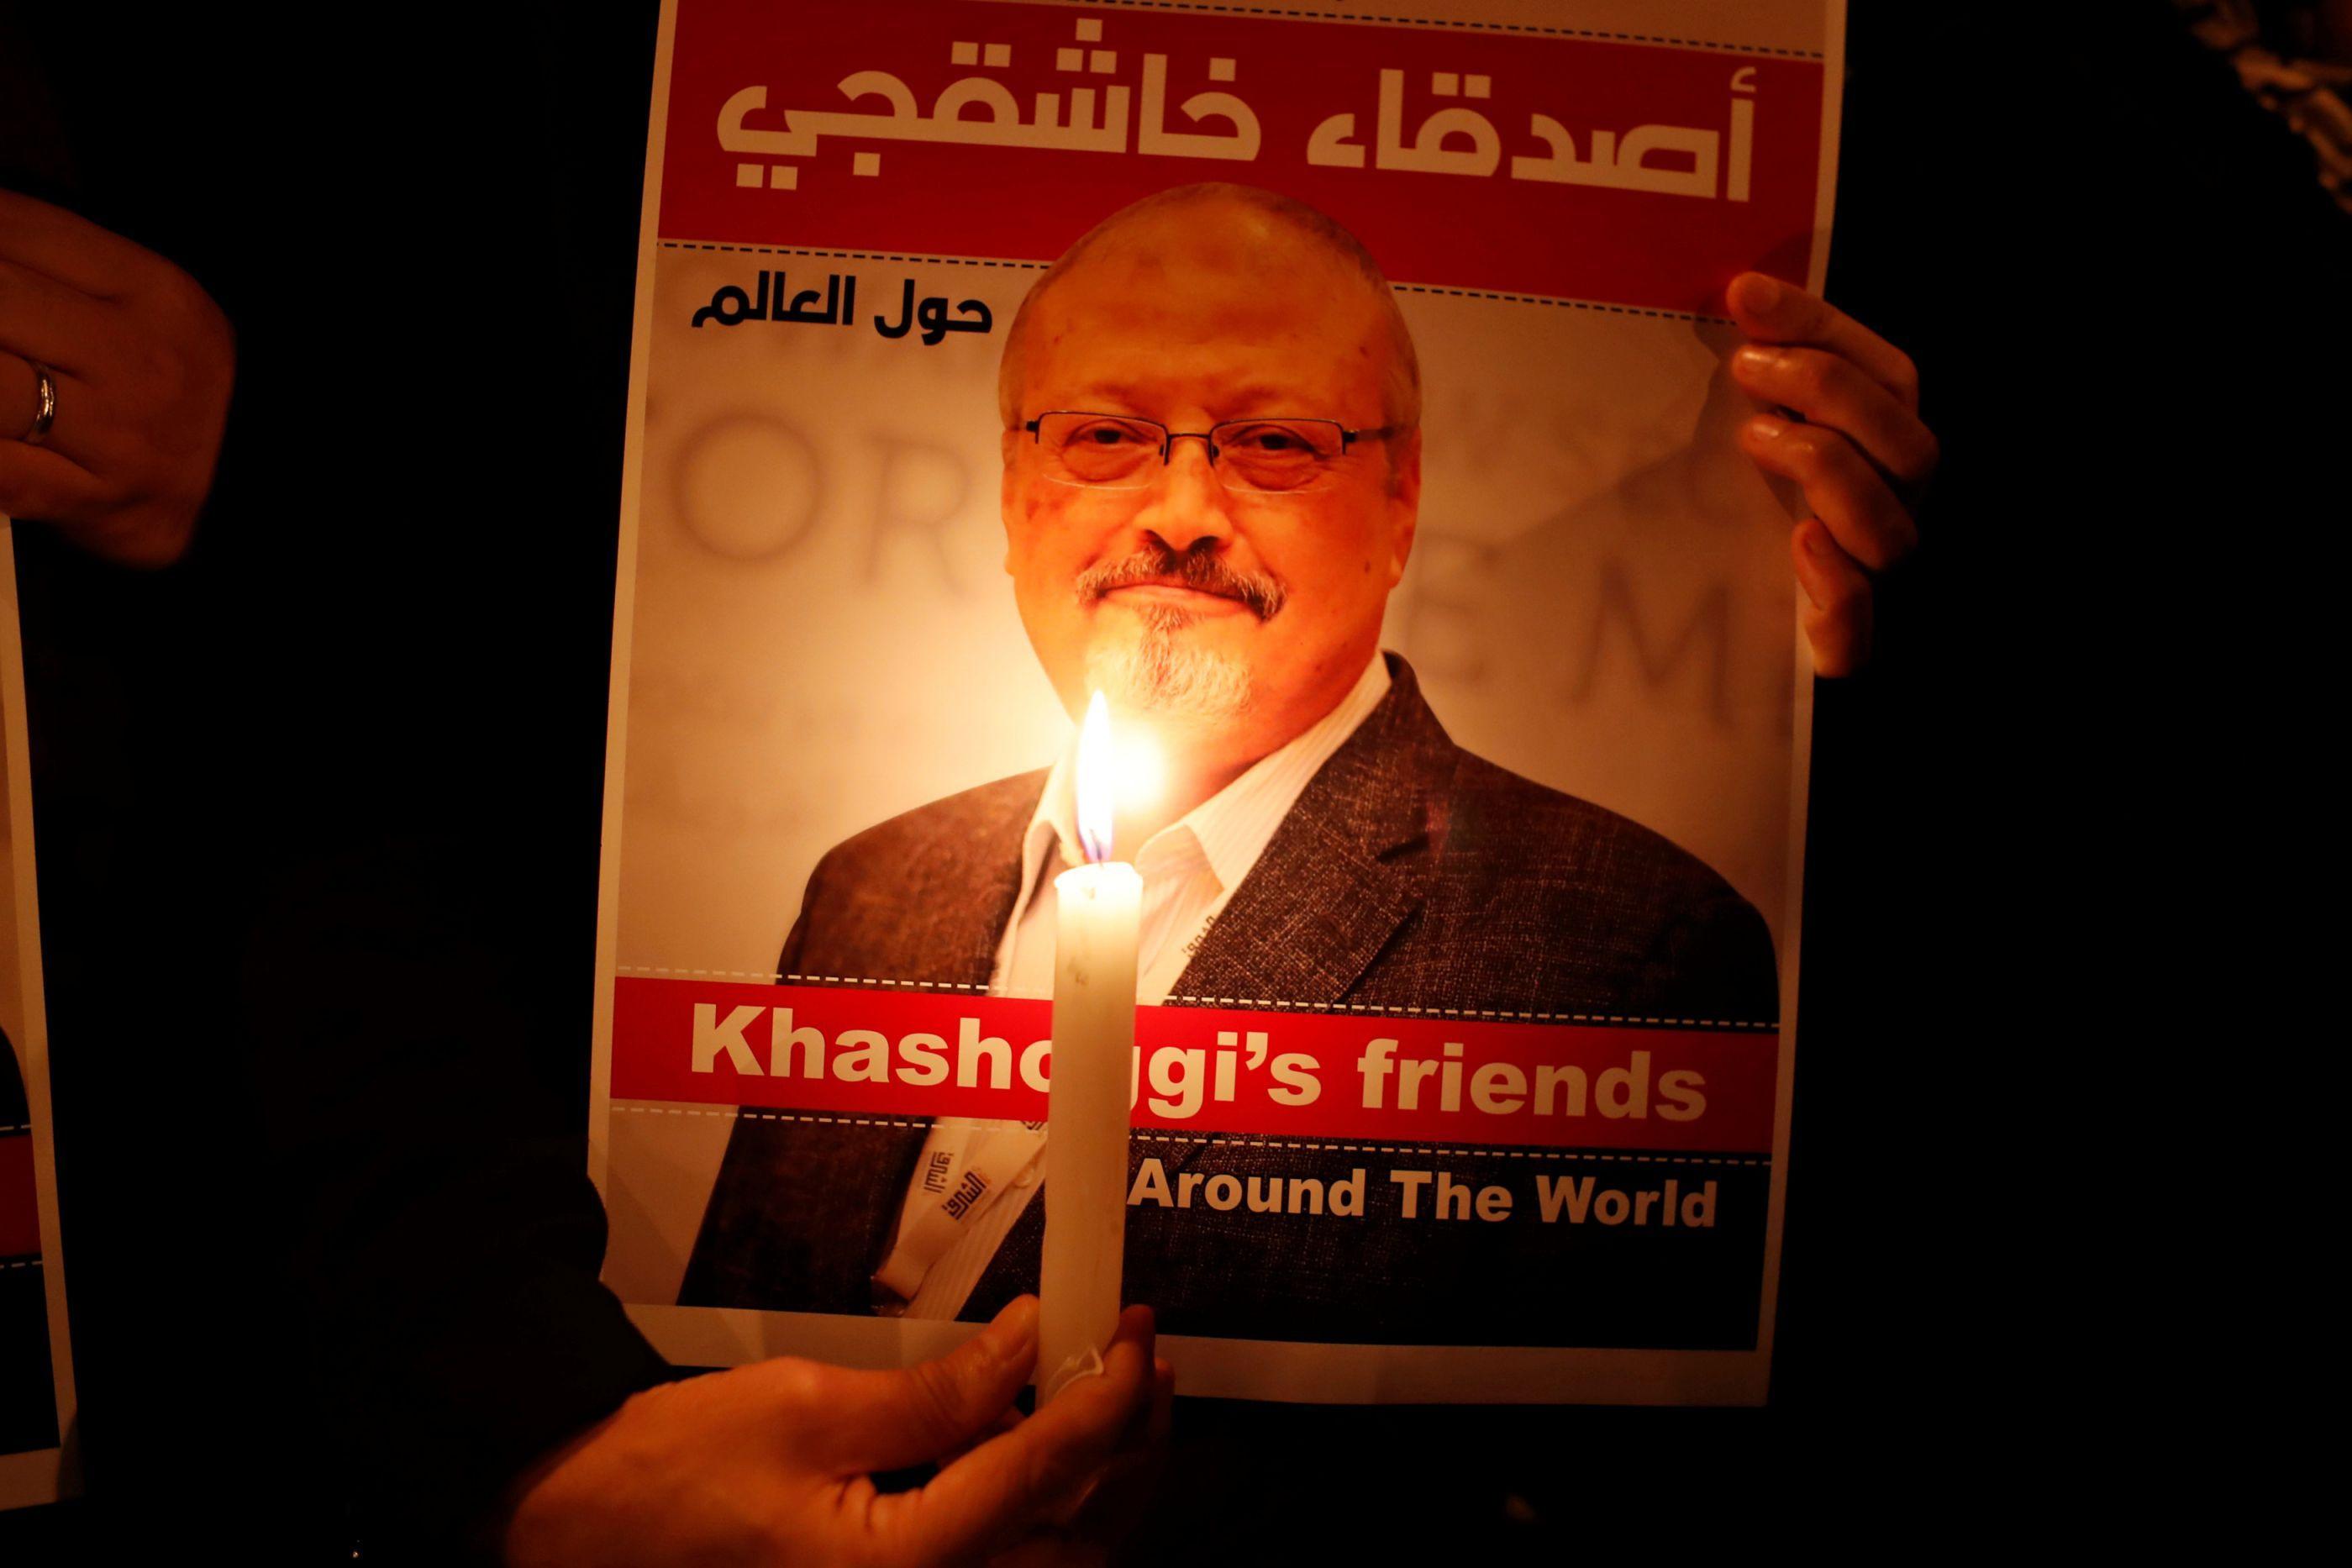 Corpo de Khashoggi foi dissolvido, diz assessor de Erdorgan